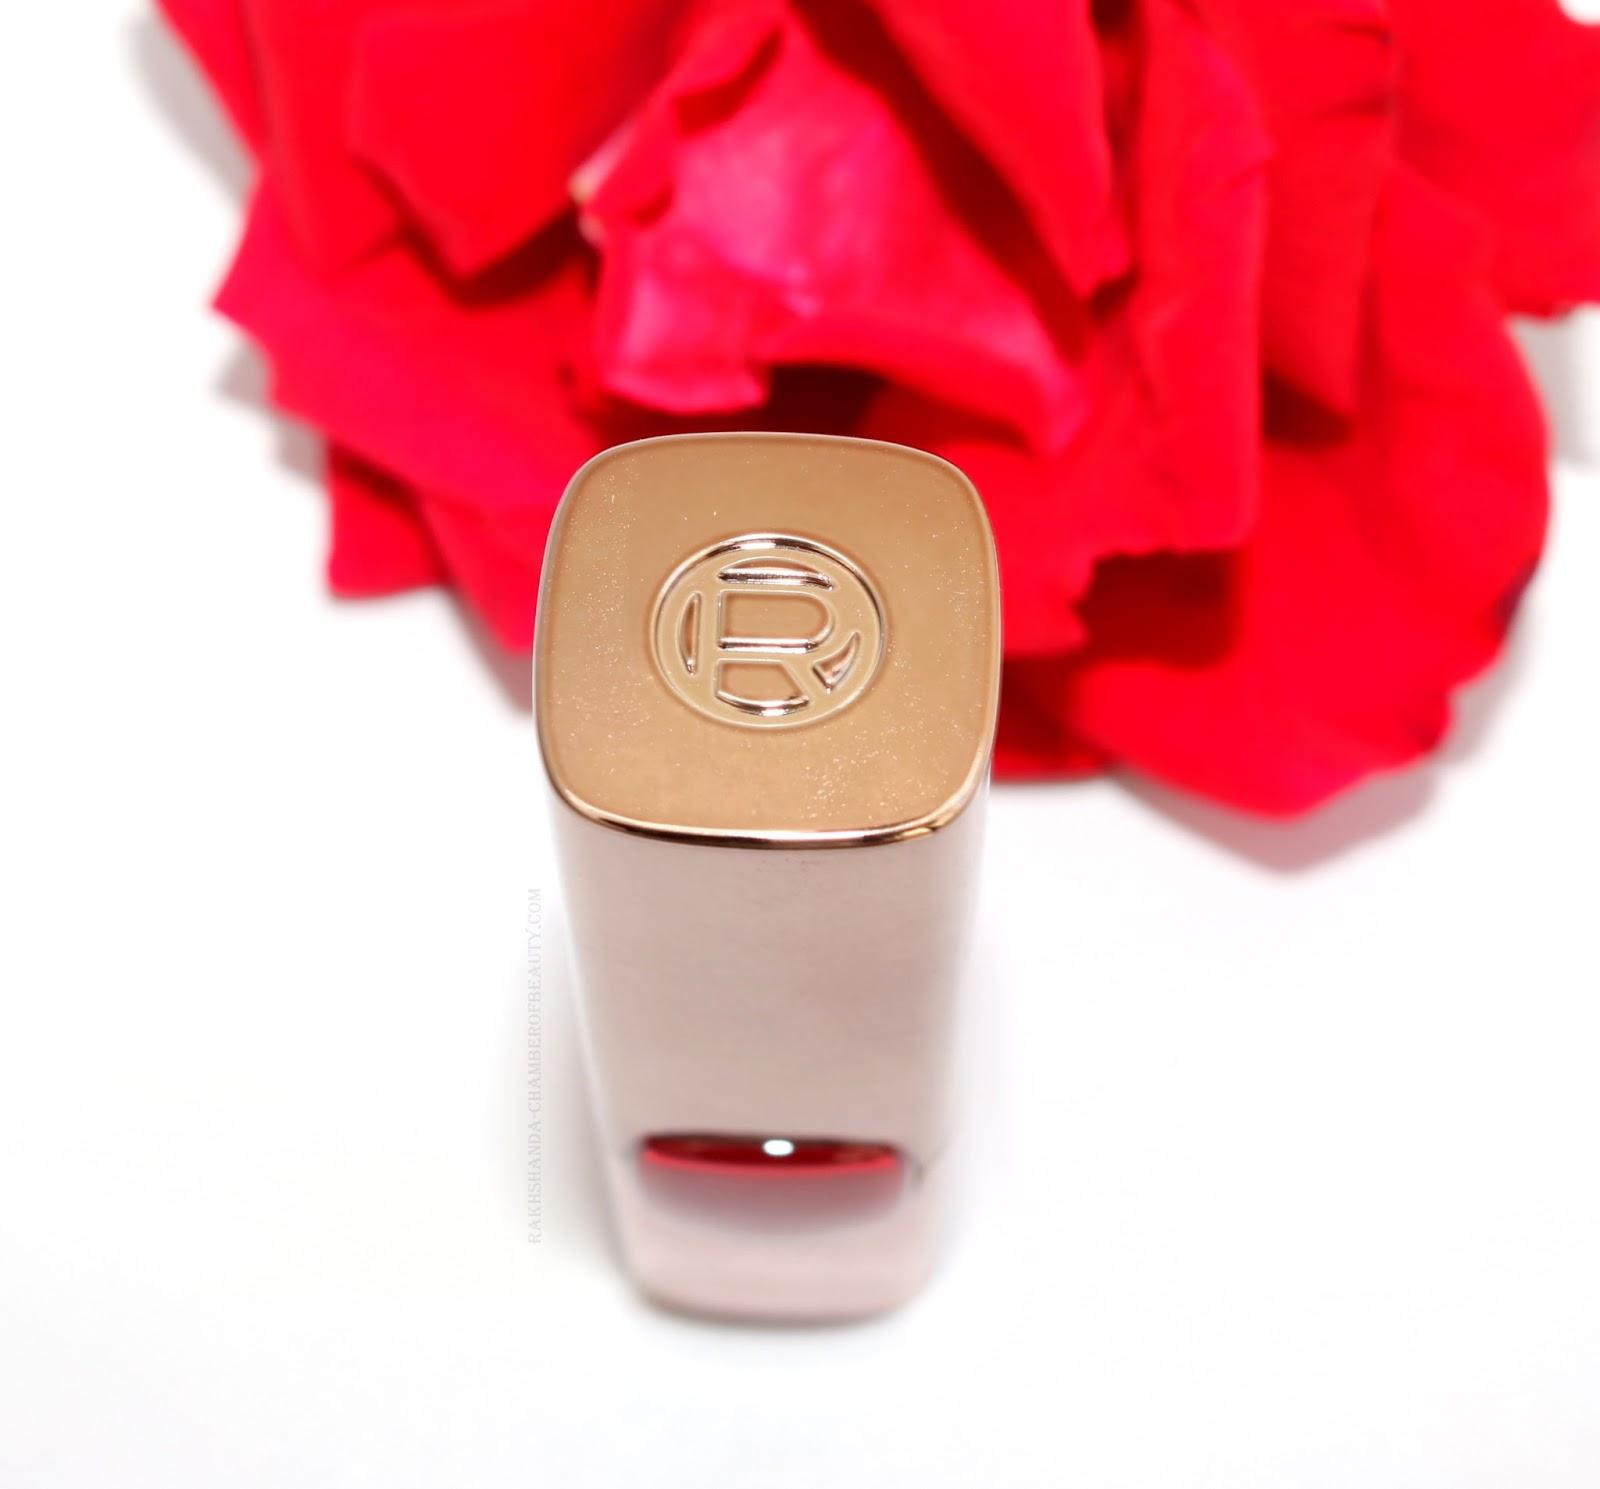 L'Oreal Paris Color Riche Moist Matte Lipstick-Blaze of Red Review/www.rakhshanda-chamberofbeauty.com/Indian beauty blogger